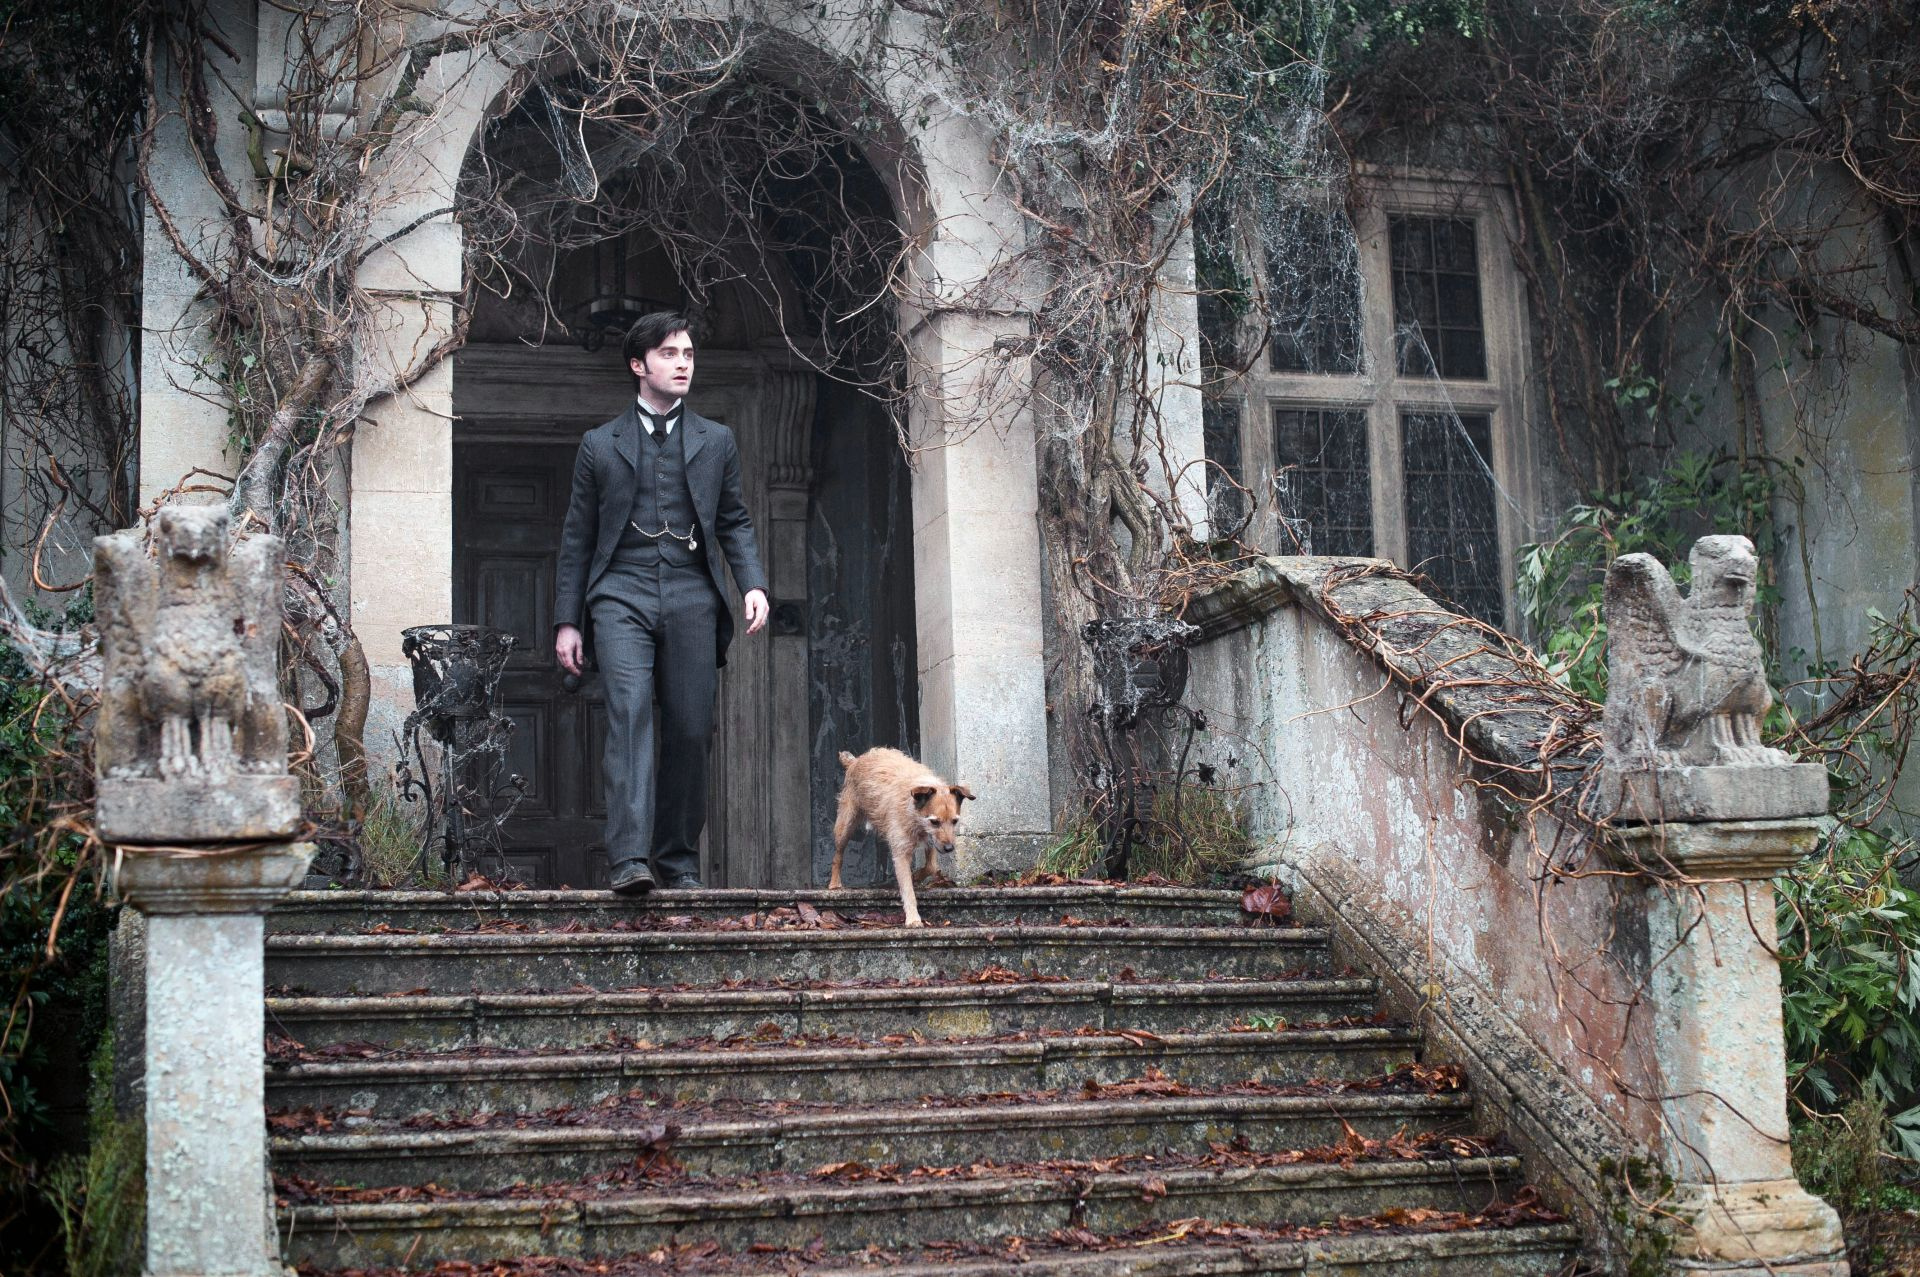 the-woman-in-black-daniel-radcliffe-dog-harry-potter – film i väst en